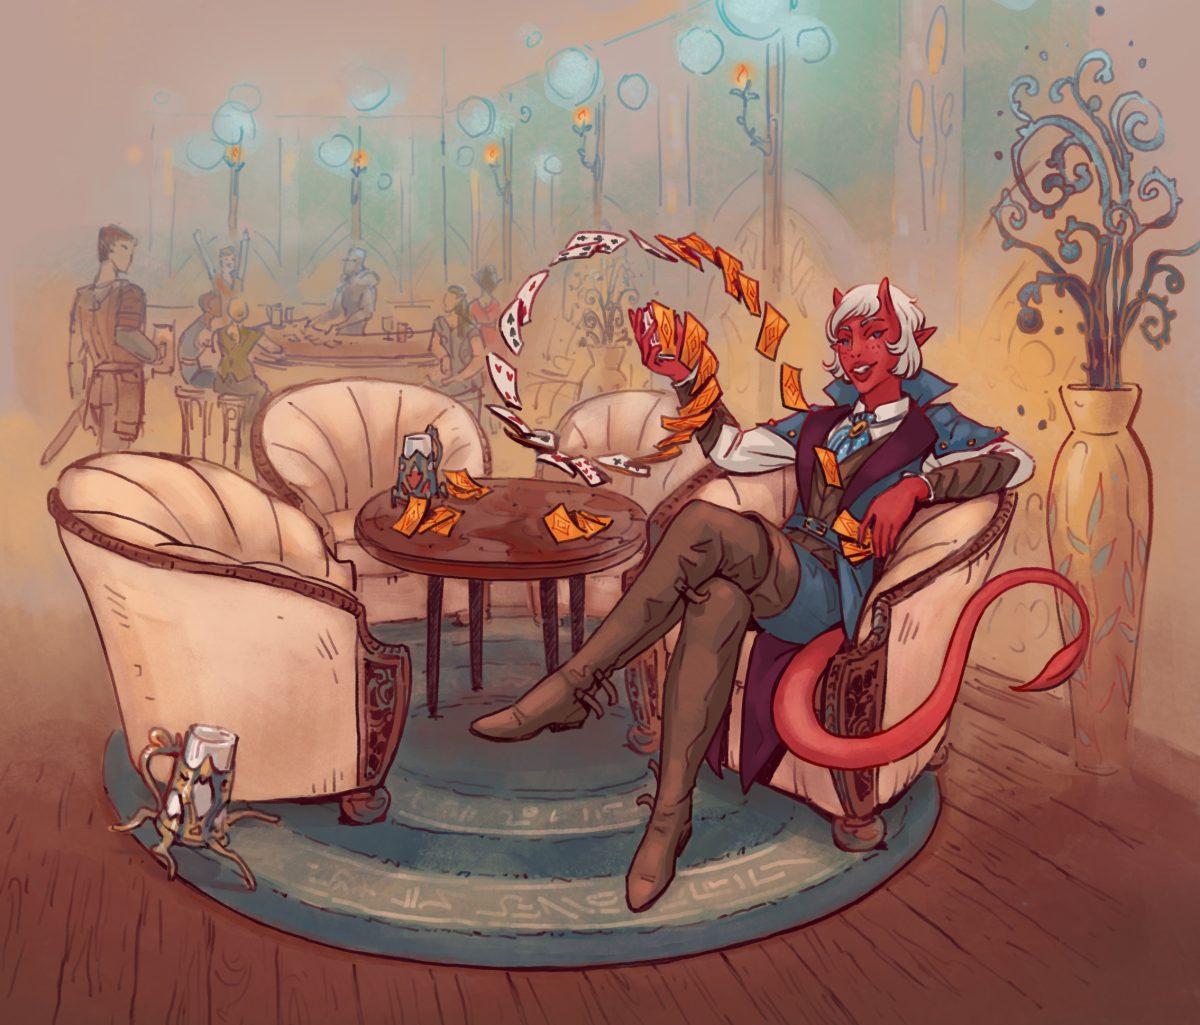 tiefling bard playing cards